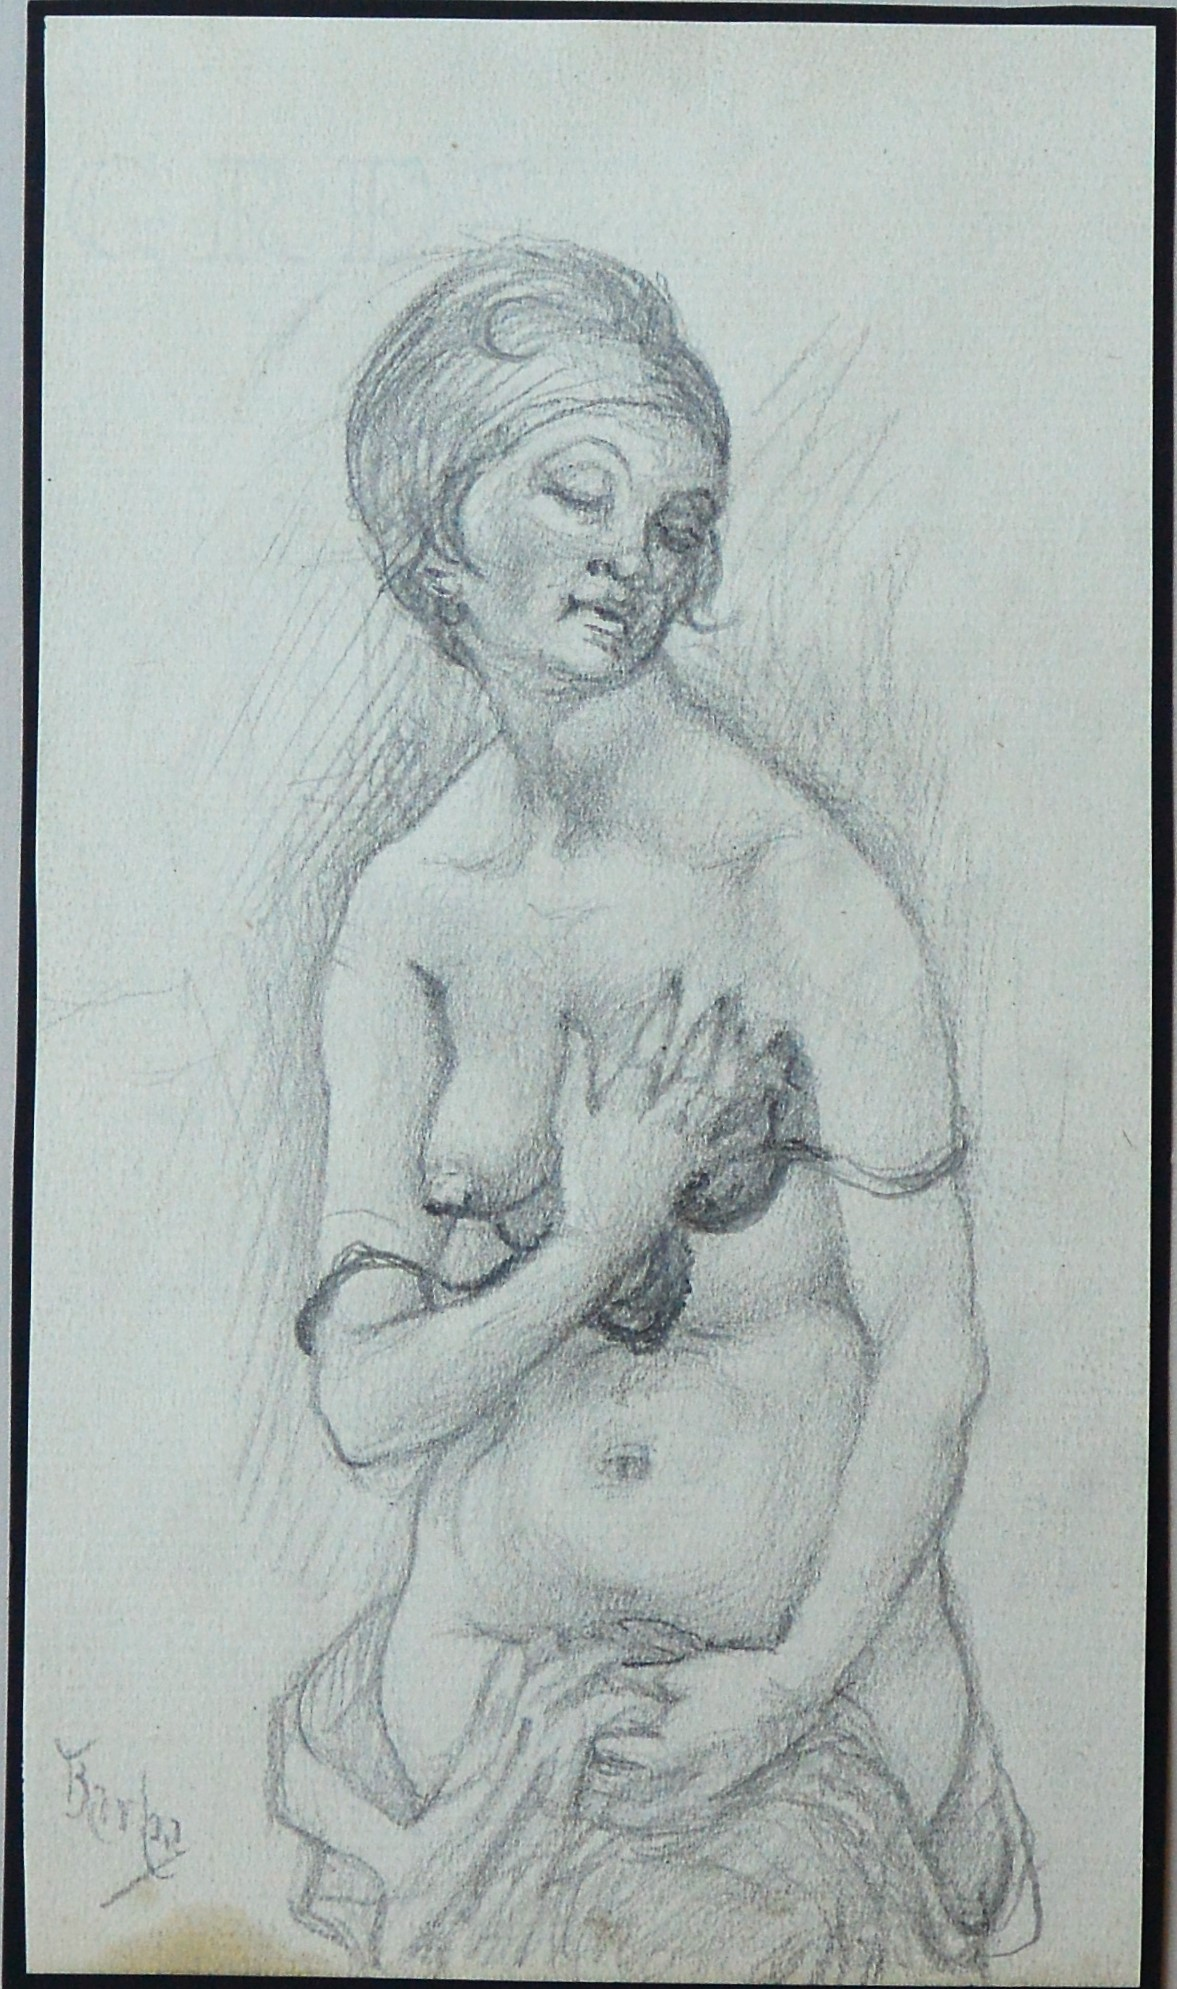 El dibujo sensitivo y expresivo de la figura humana cfnm 6